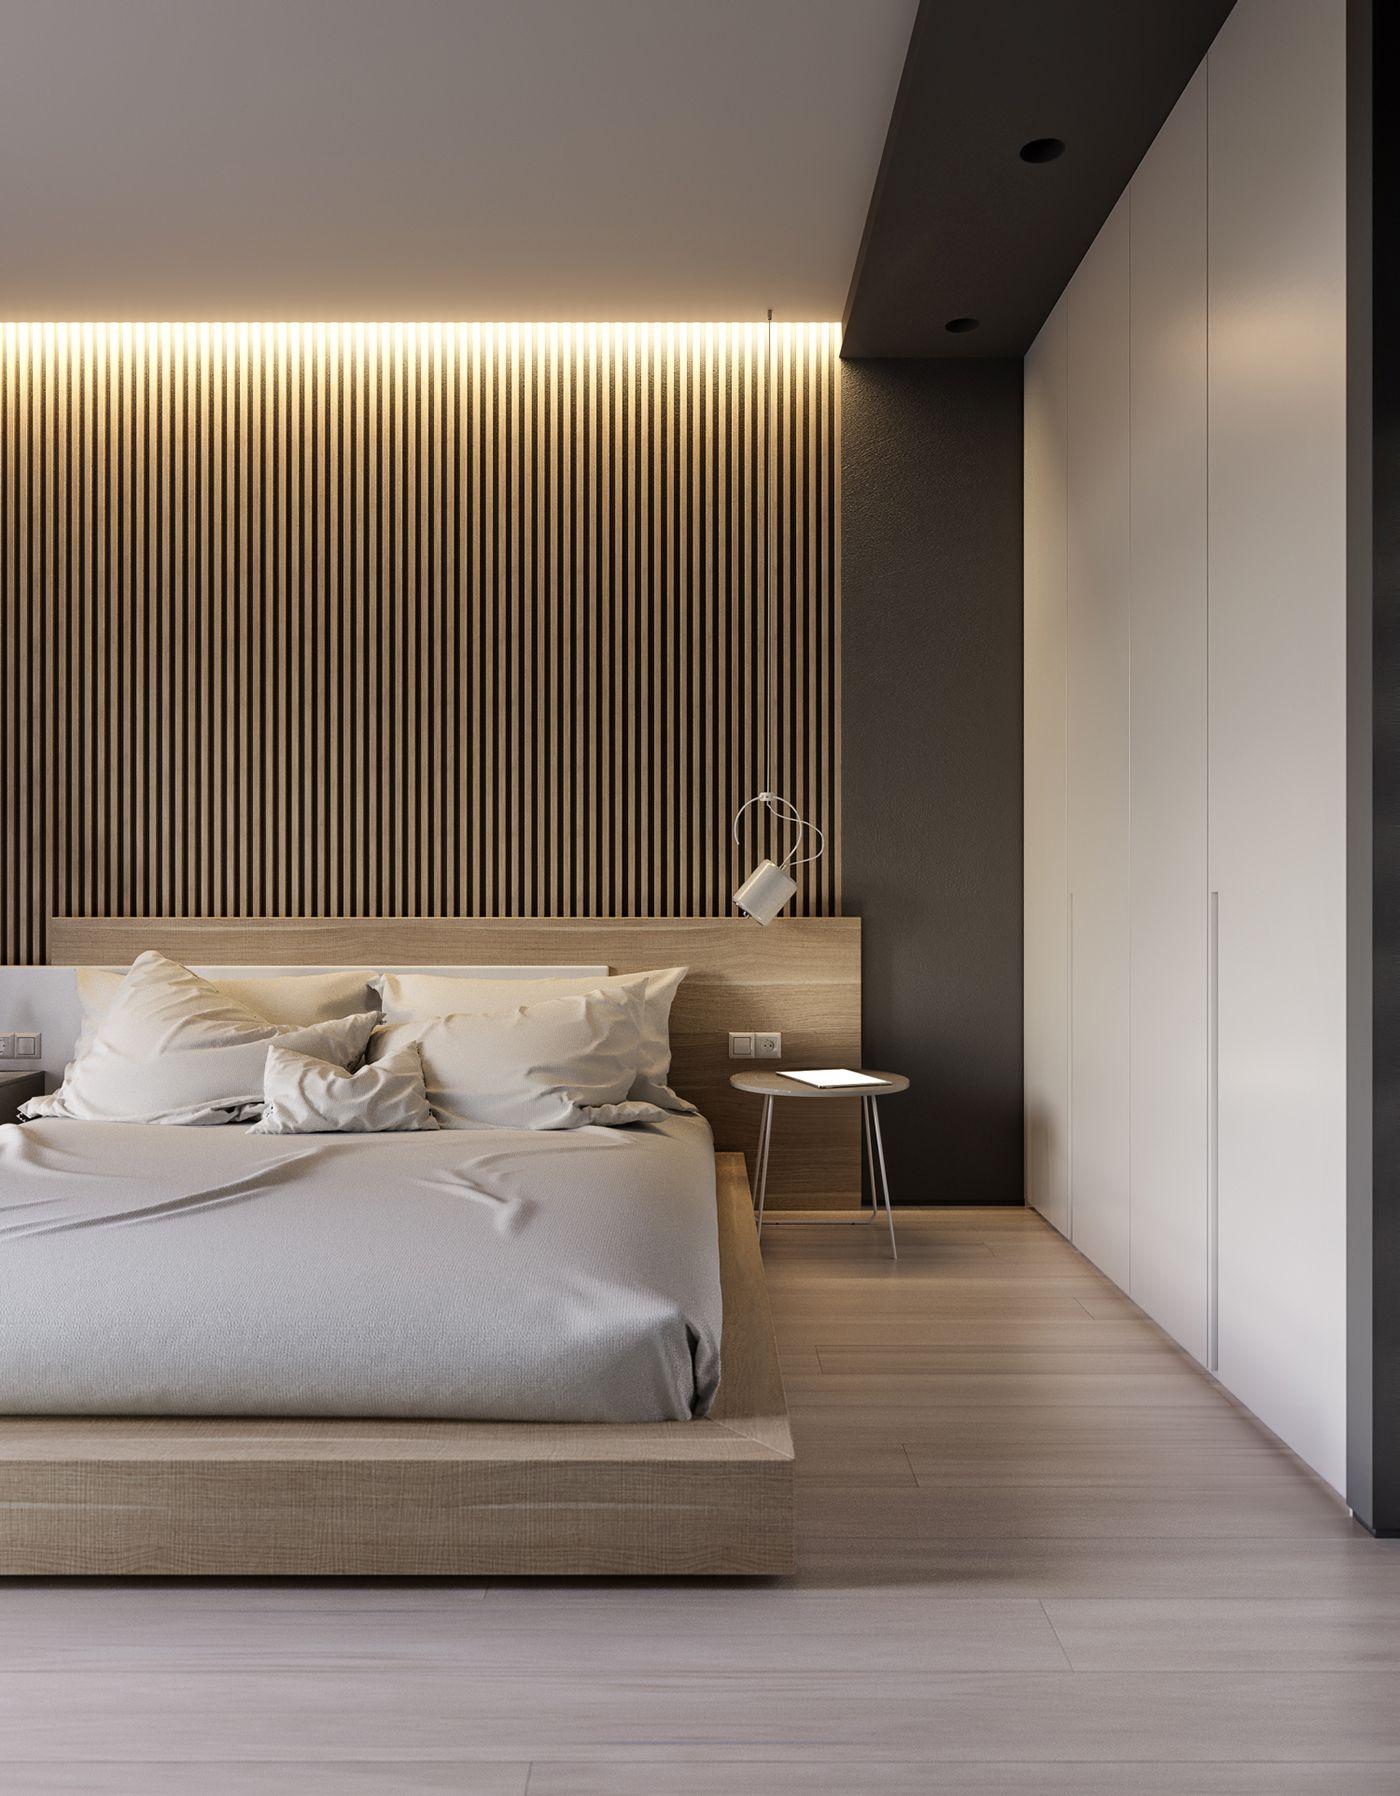 Pin By Hangang On Badroom Pinterest Bedrooms And Design Bedroom Modern Minimalist Bedroom Bedroom Design Bedroom Lamps Design